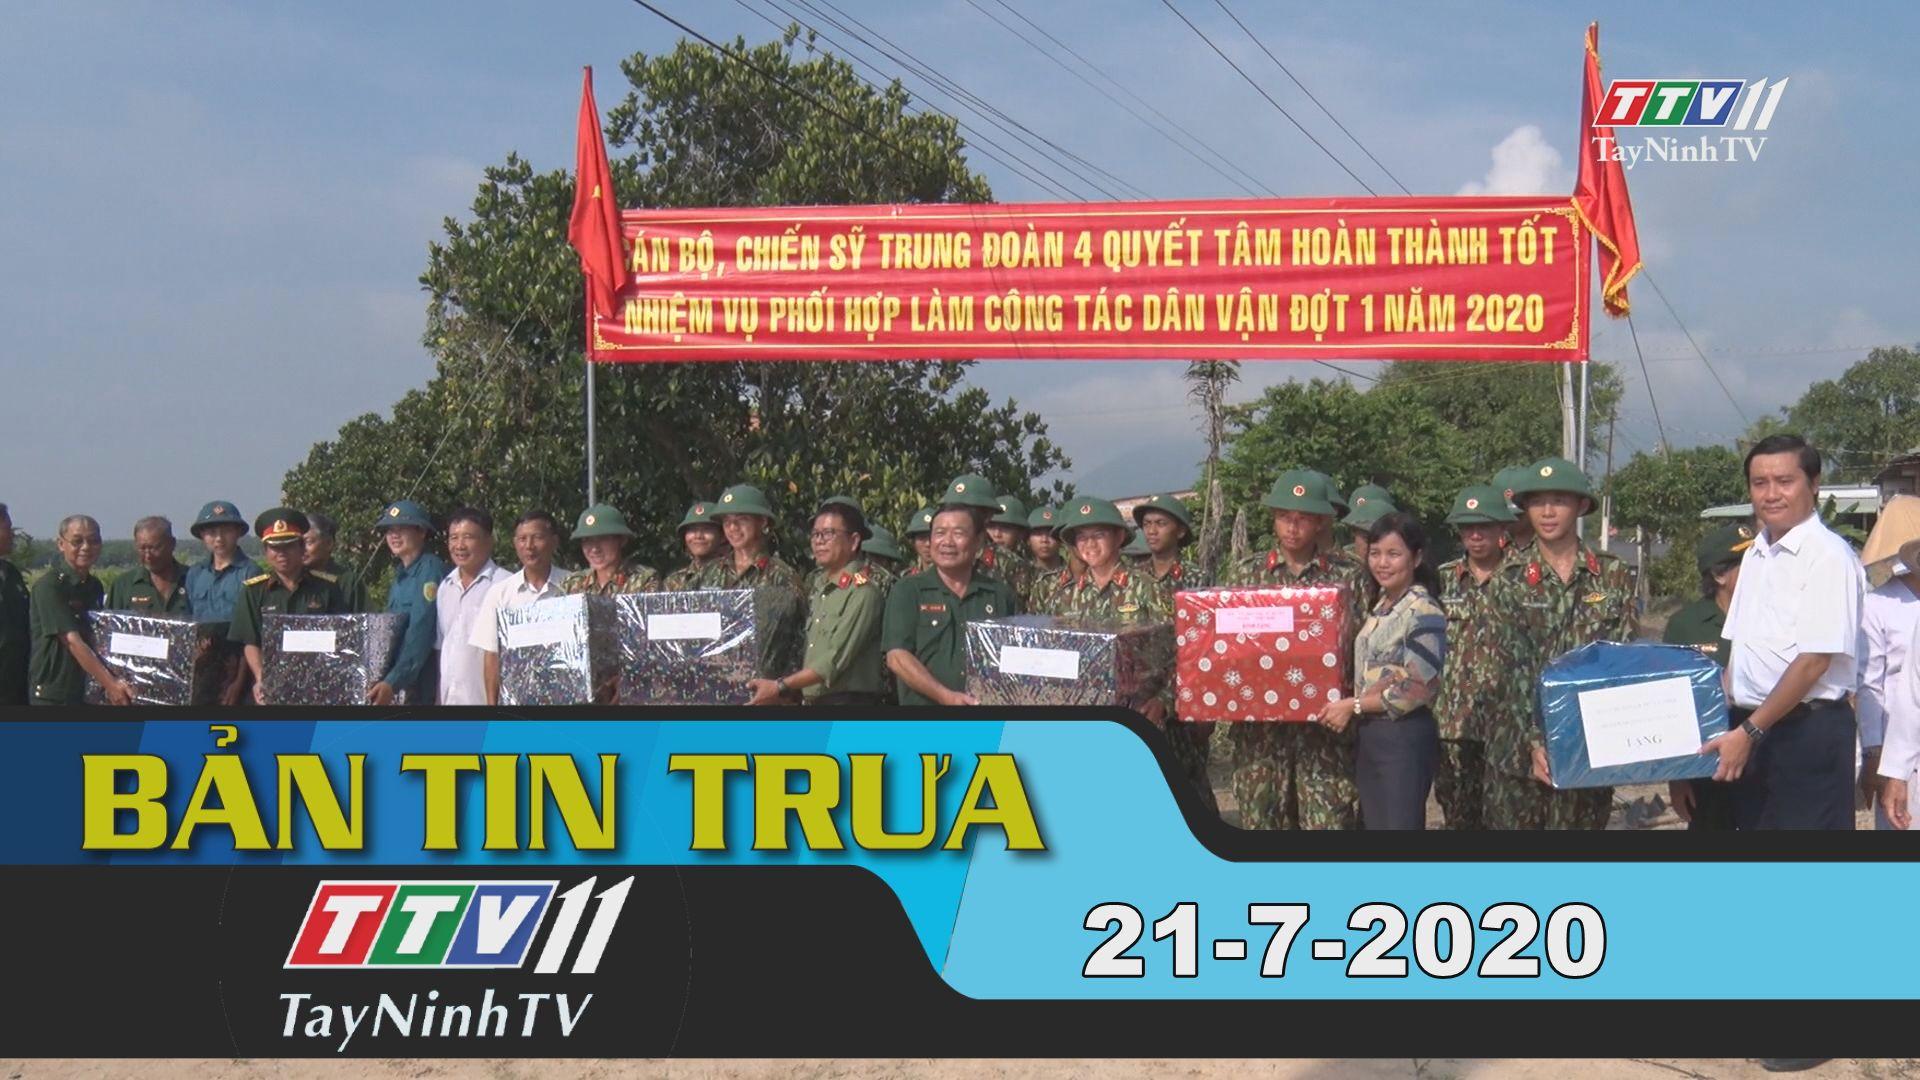 Bản tin trưa 21-7-2020 | Tin tức hôm nay | TayNinhTV